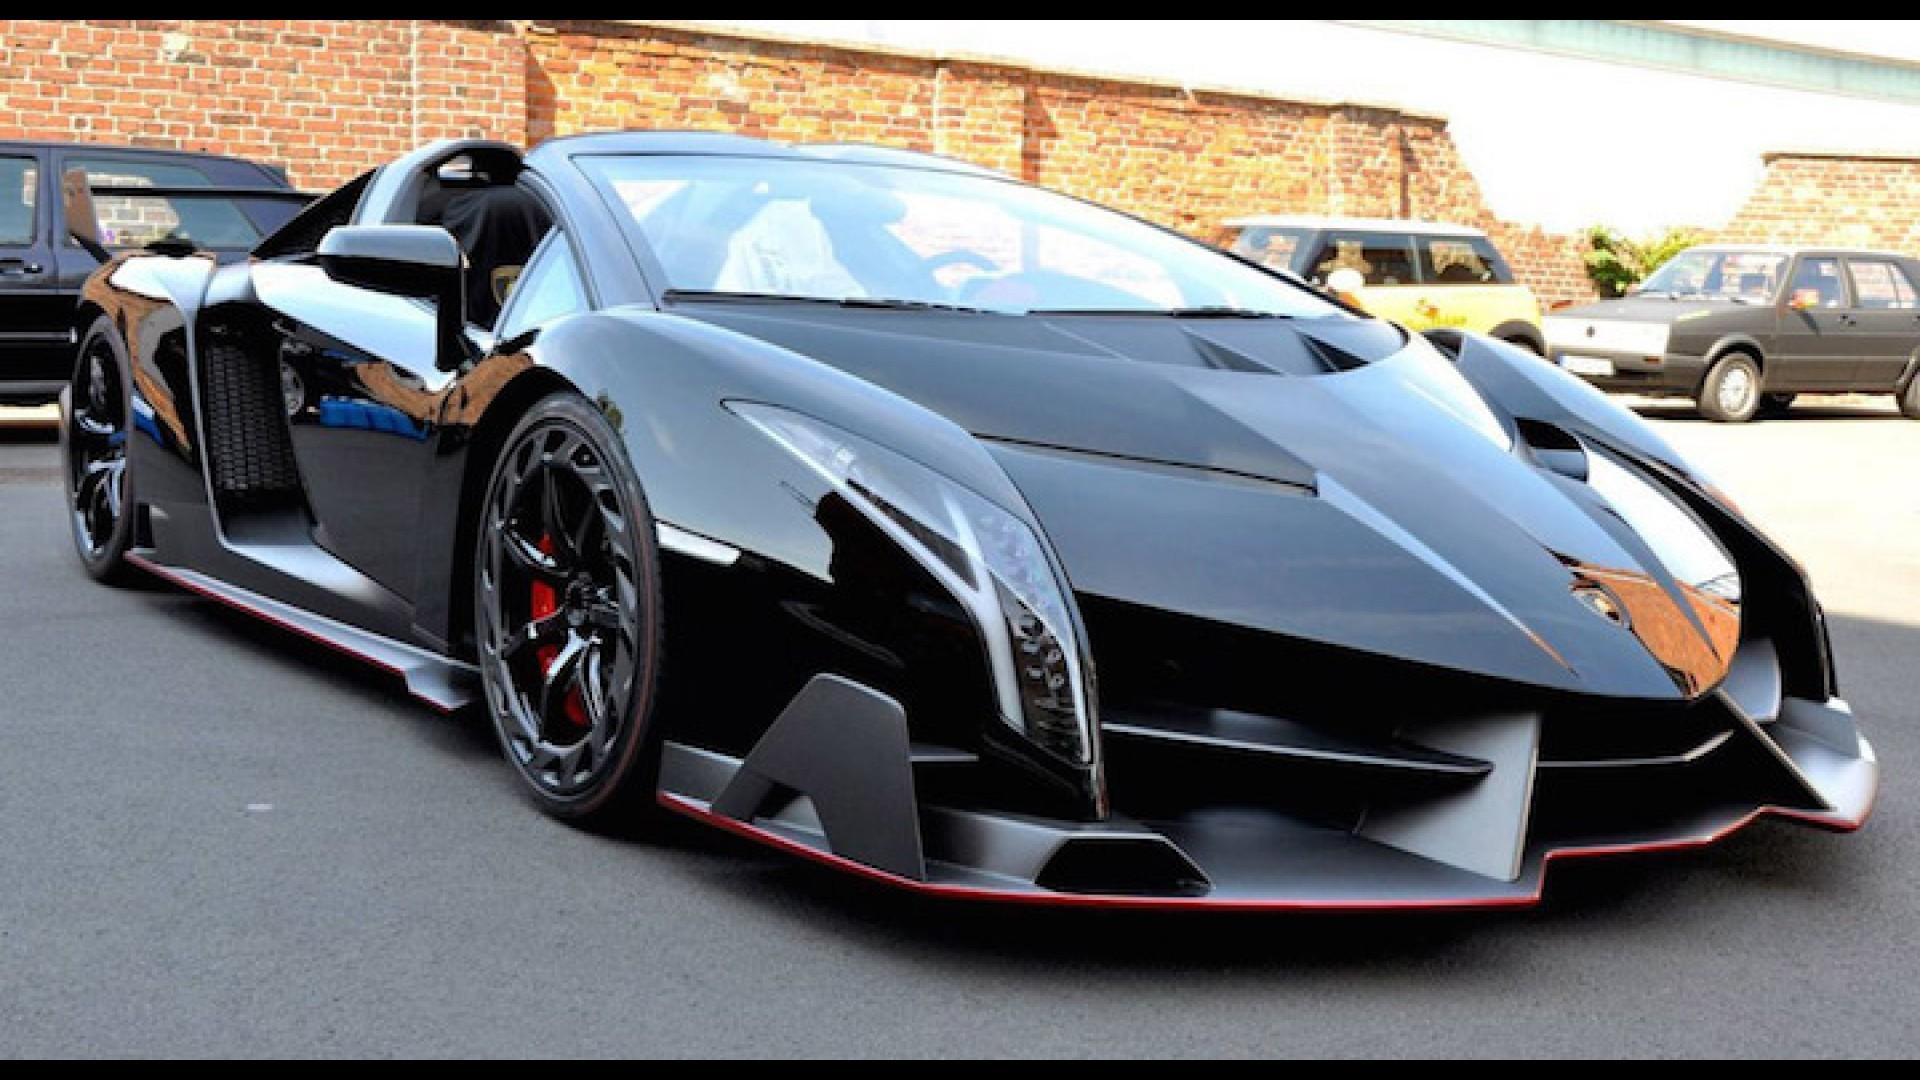 Lamborghini Veneno Roadster Sells For A Whopping 55 Million